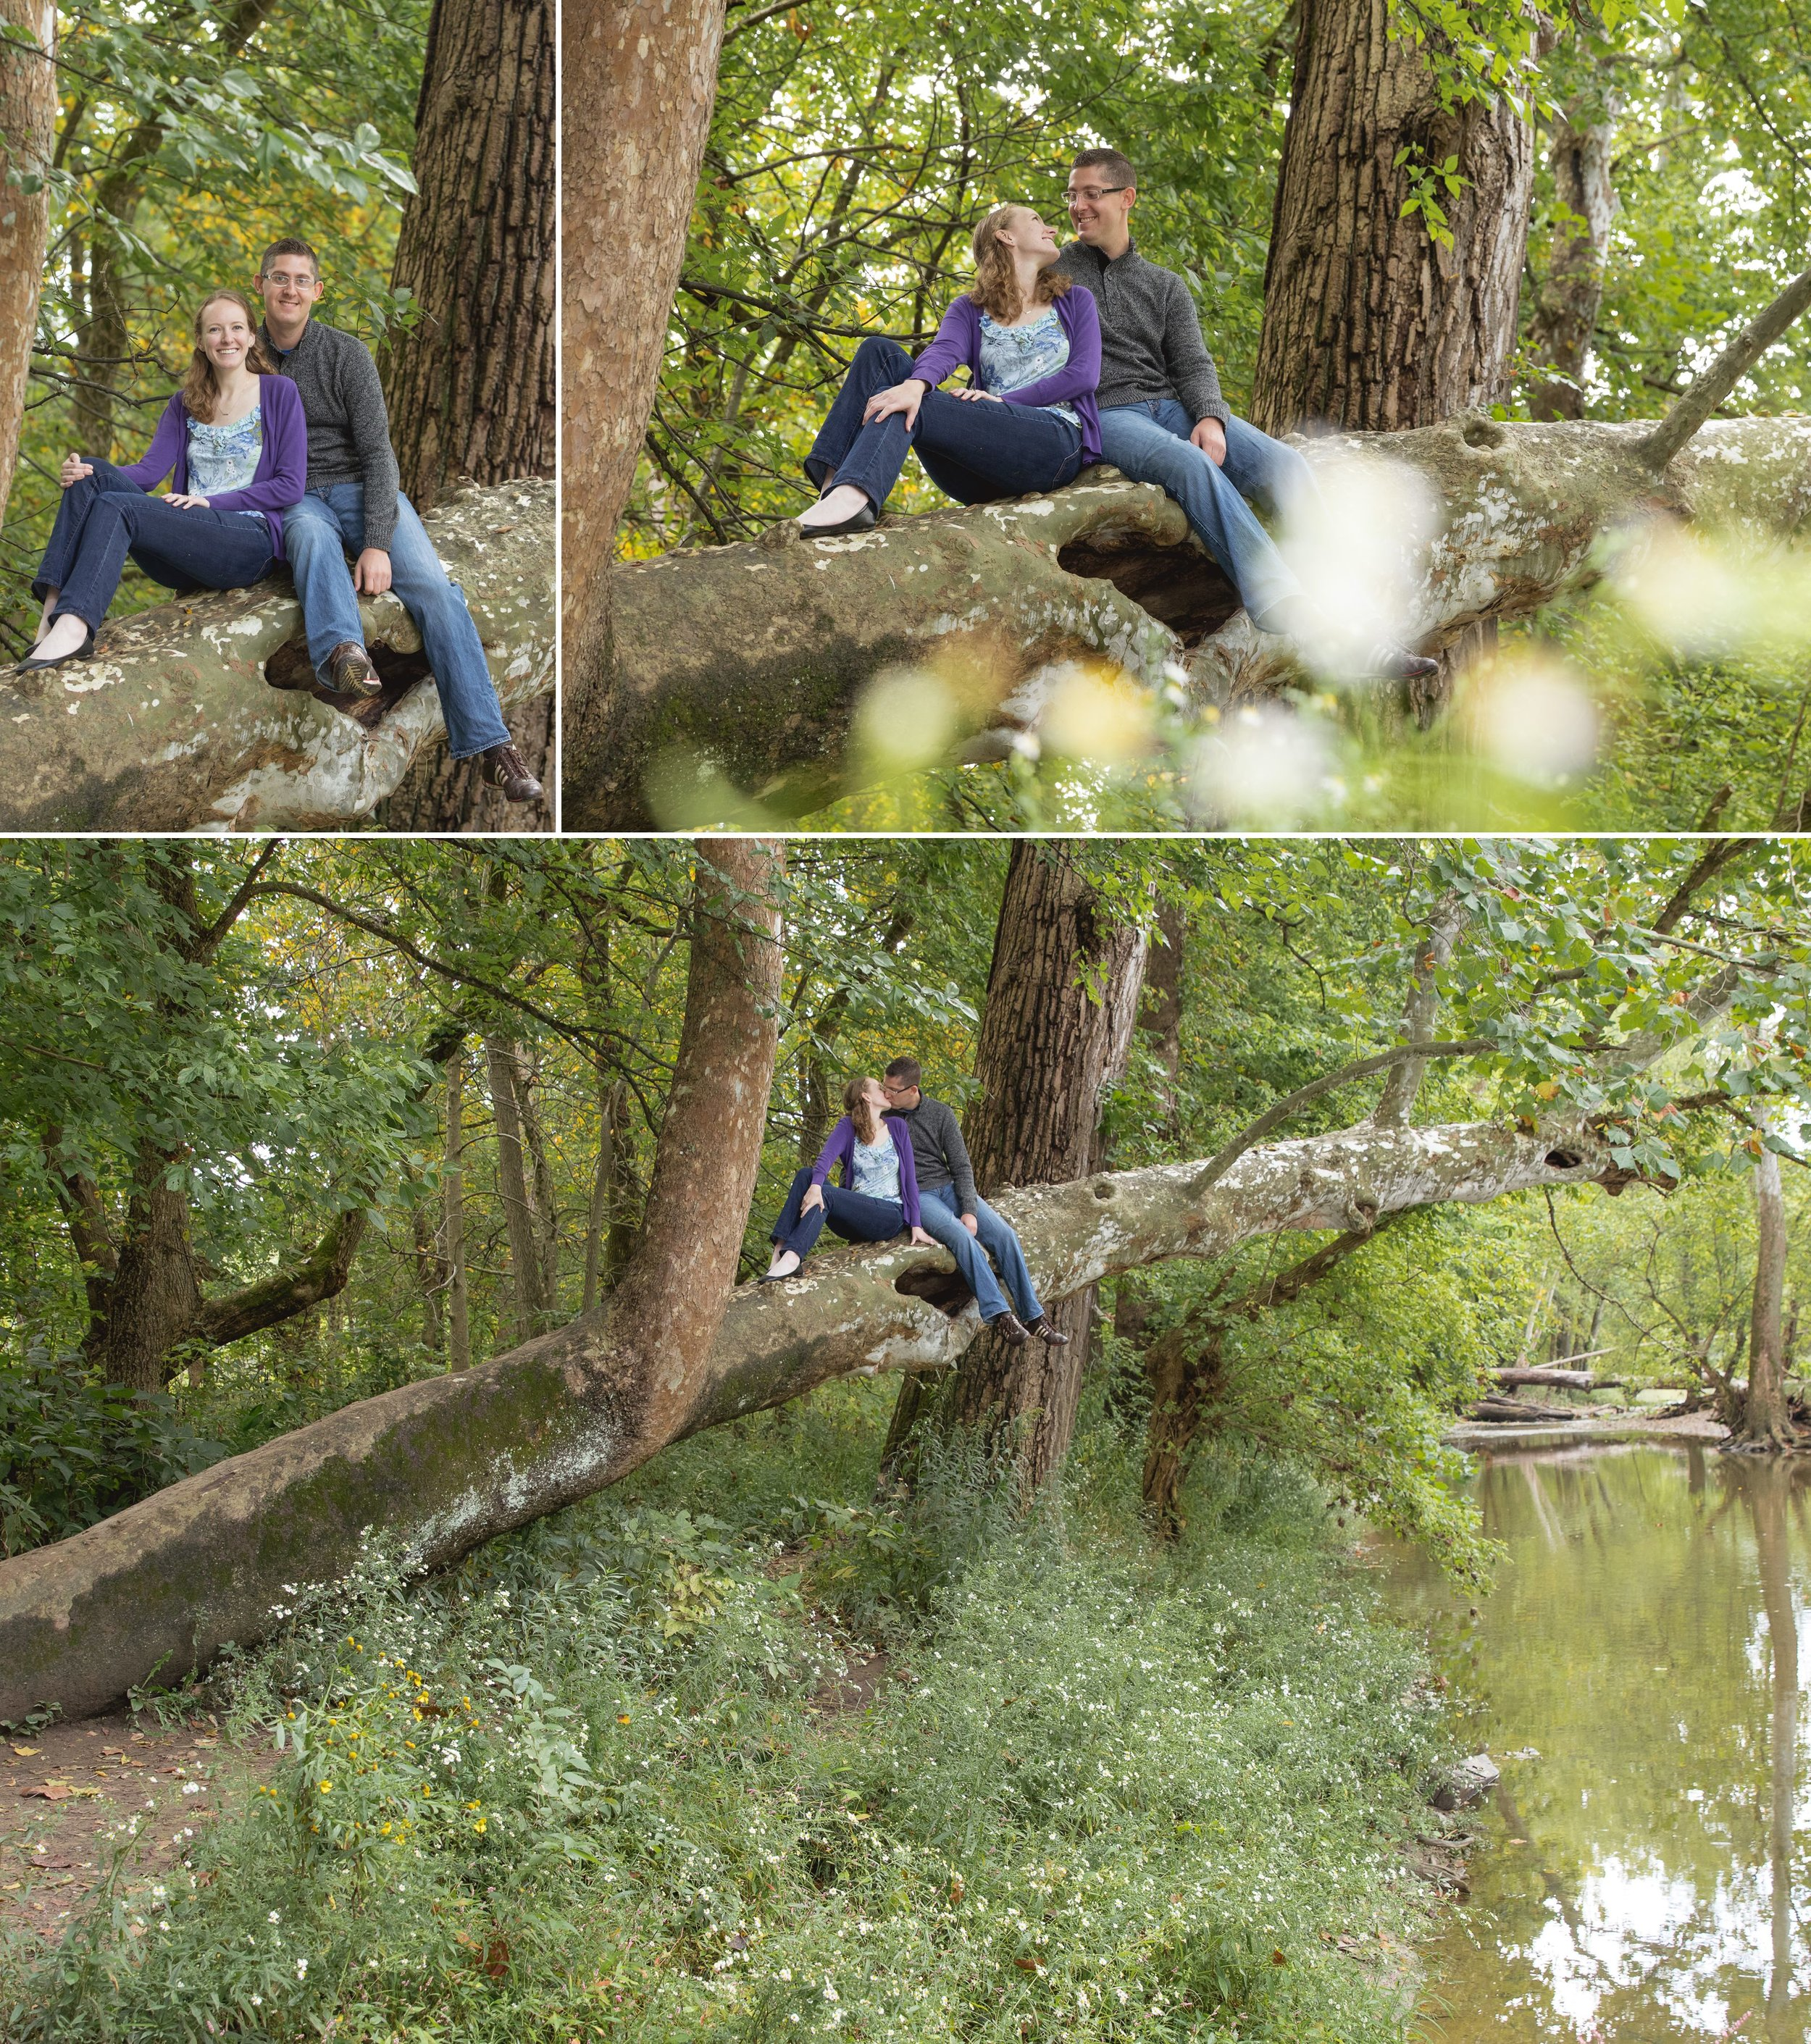 highbanks-metro-park-lewis-center-engagement-portraits-gahanna-columbus-photographer-studio-007.JPG